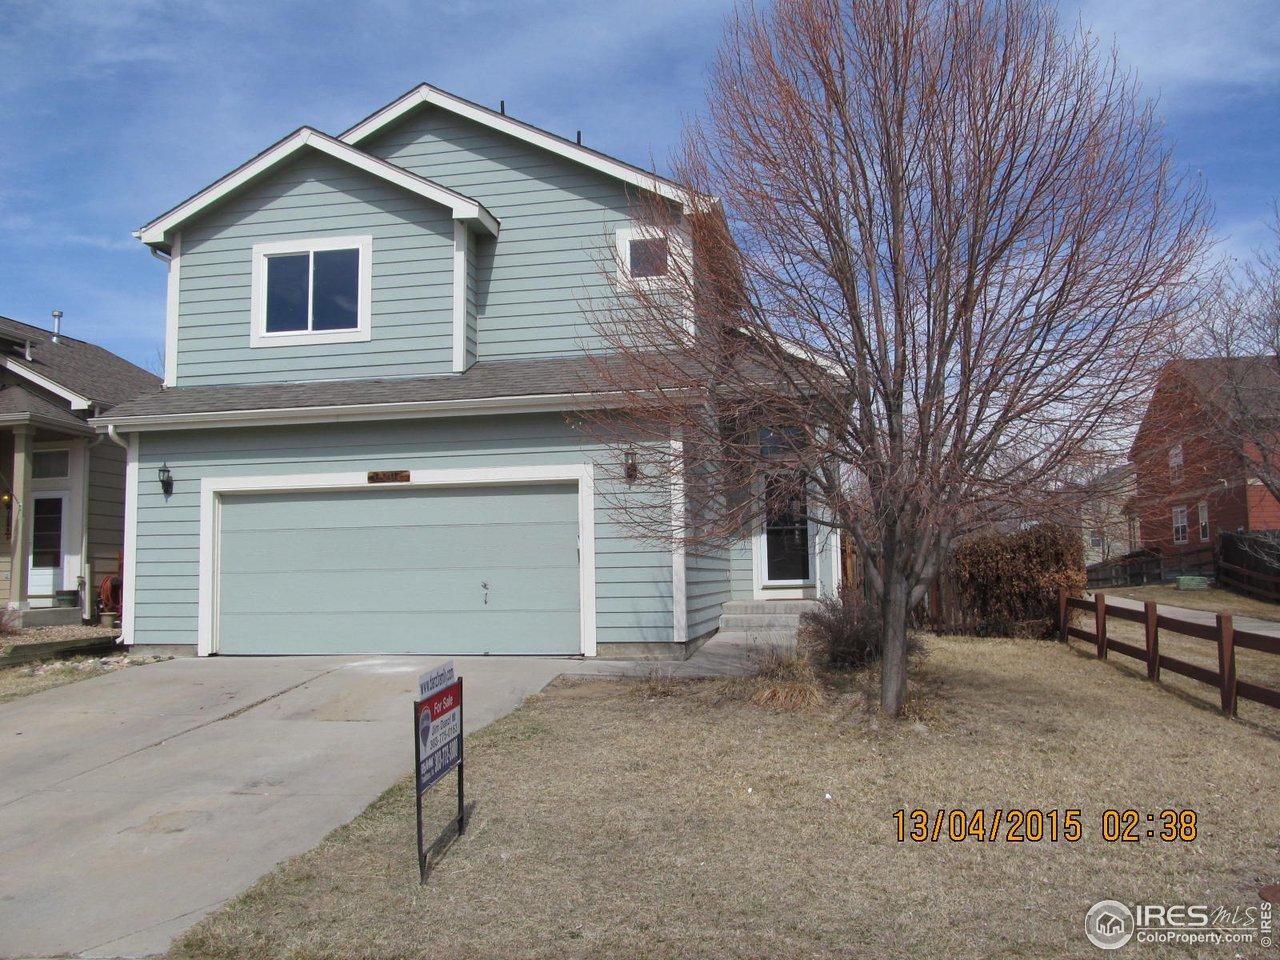 6907 Summerset Ave, Firestone CO 80504